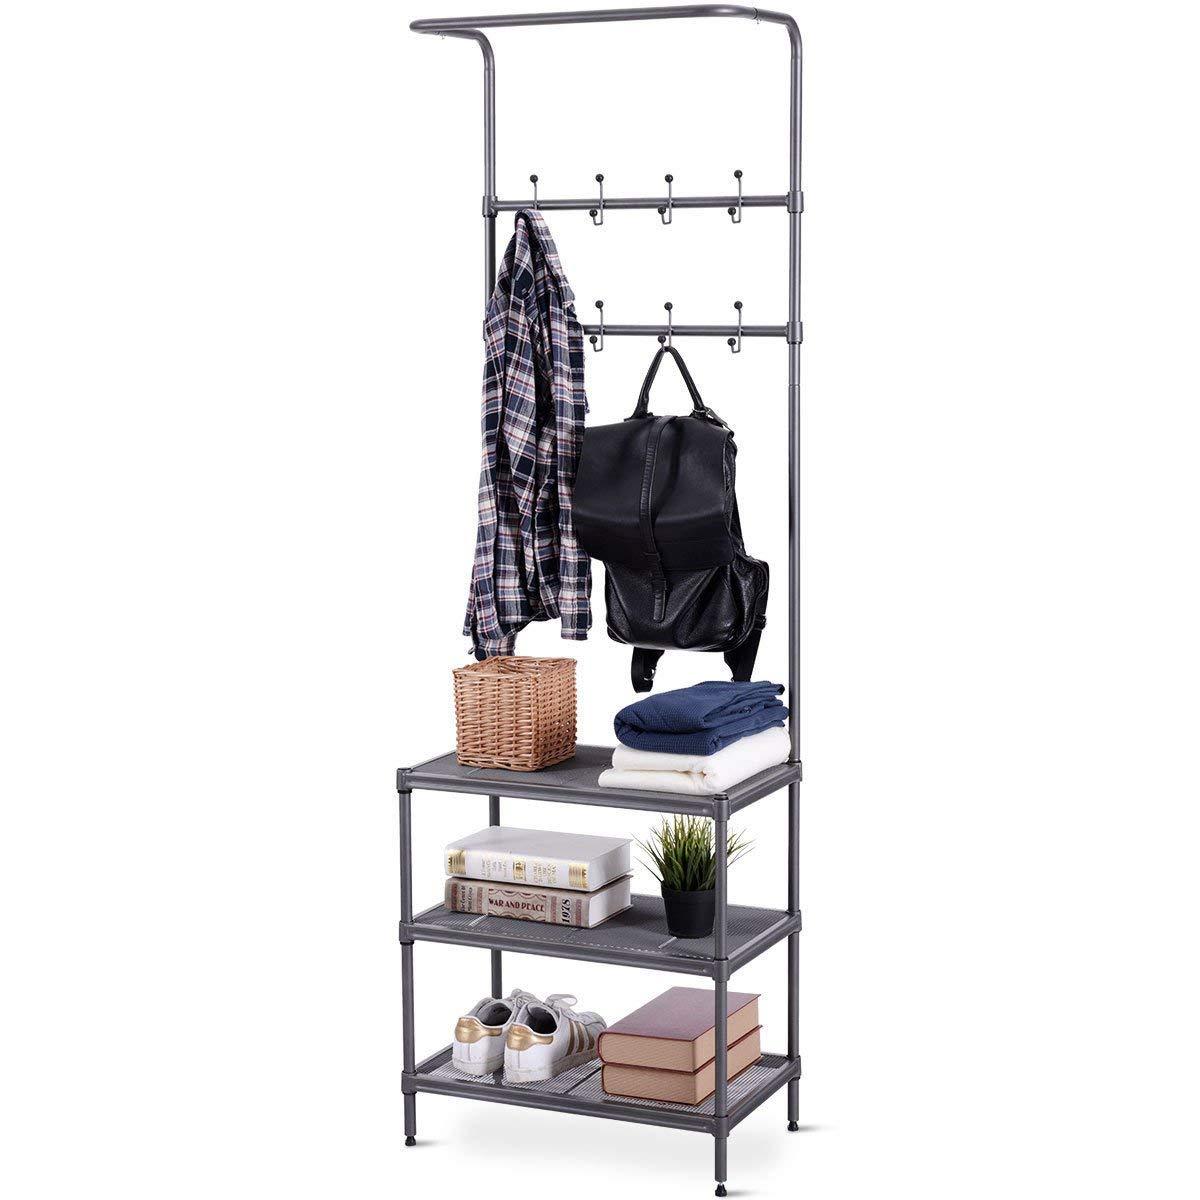 TANGKULA Coat Hat Shoes Rack 3-Tier Entryway Storage Shelf 8 Hooks Metal frame Storage Rack Accent Furniture